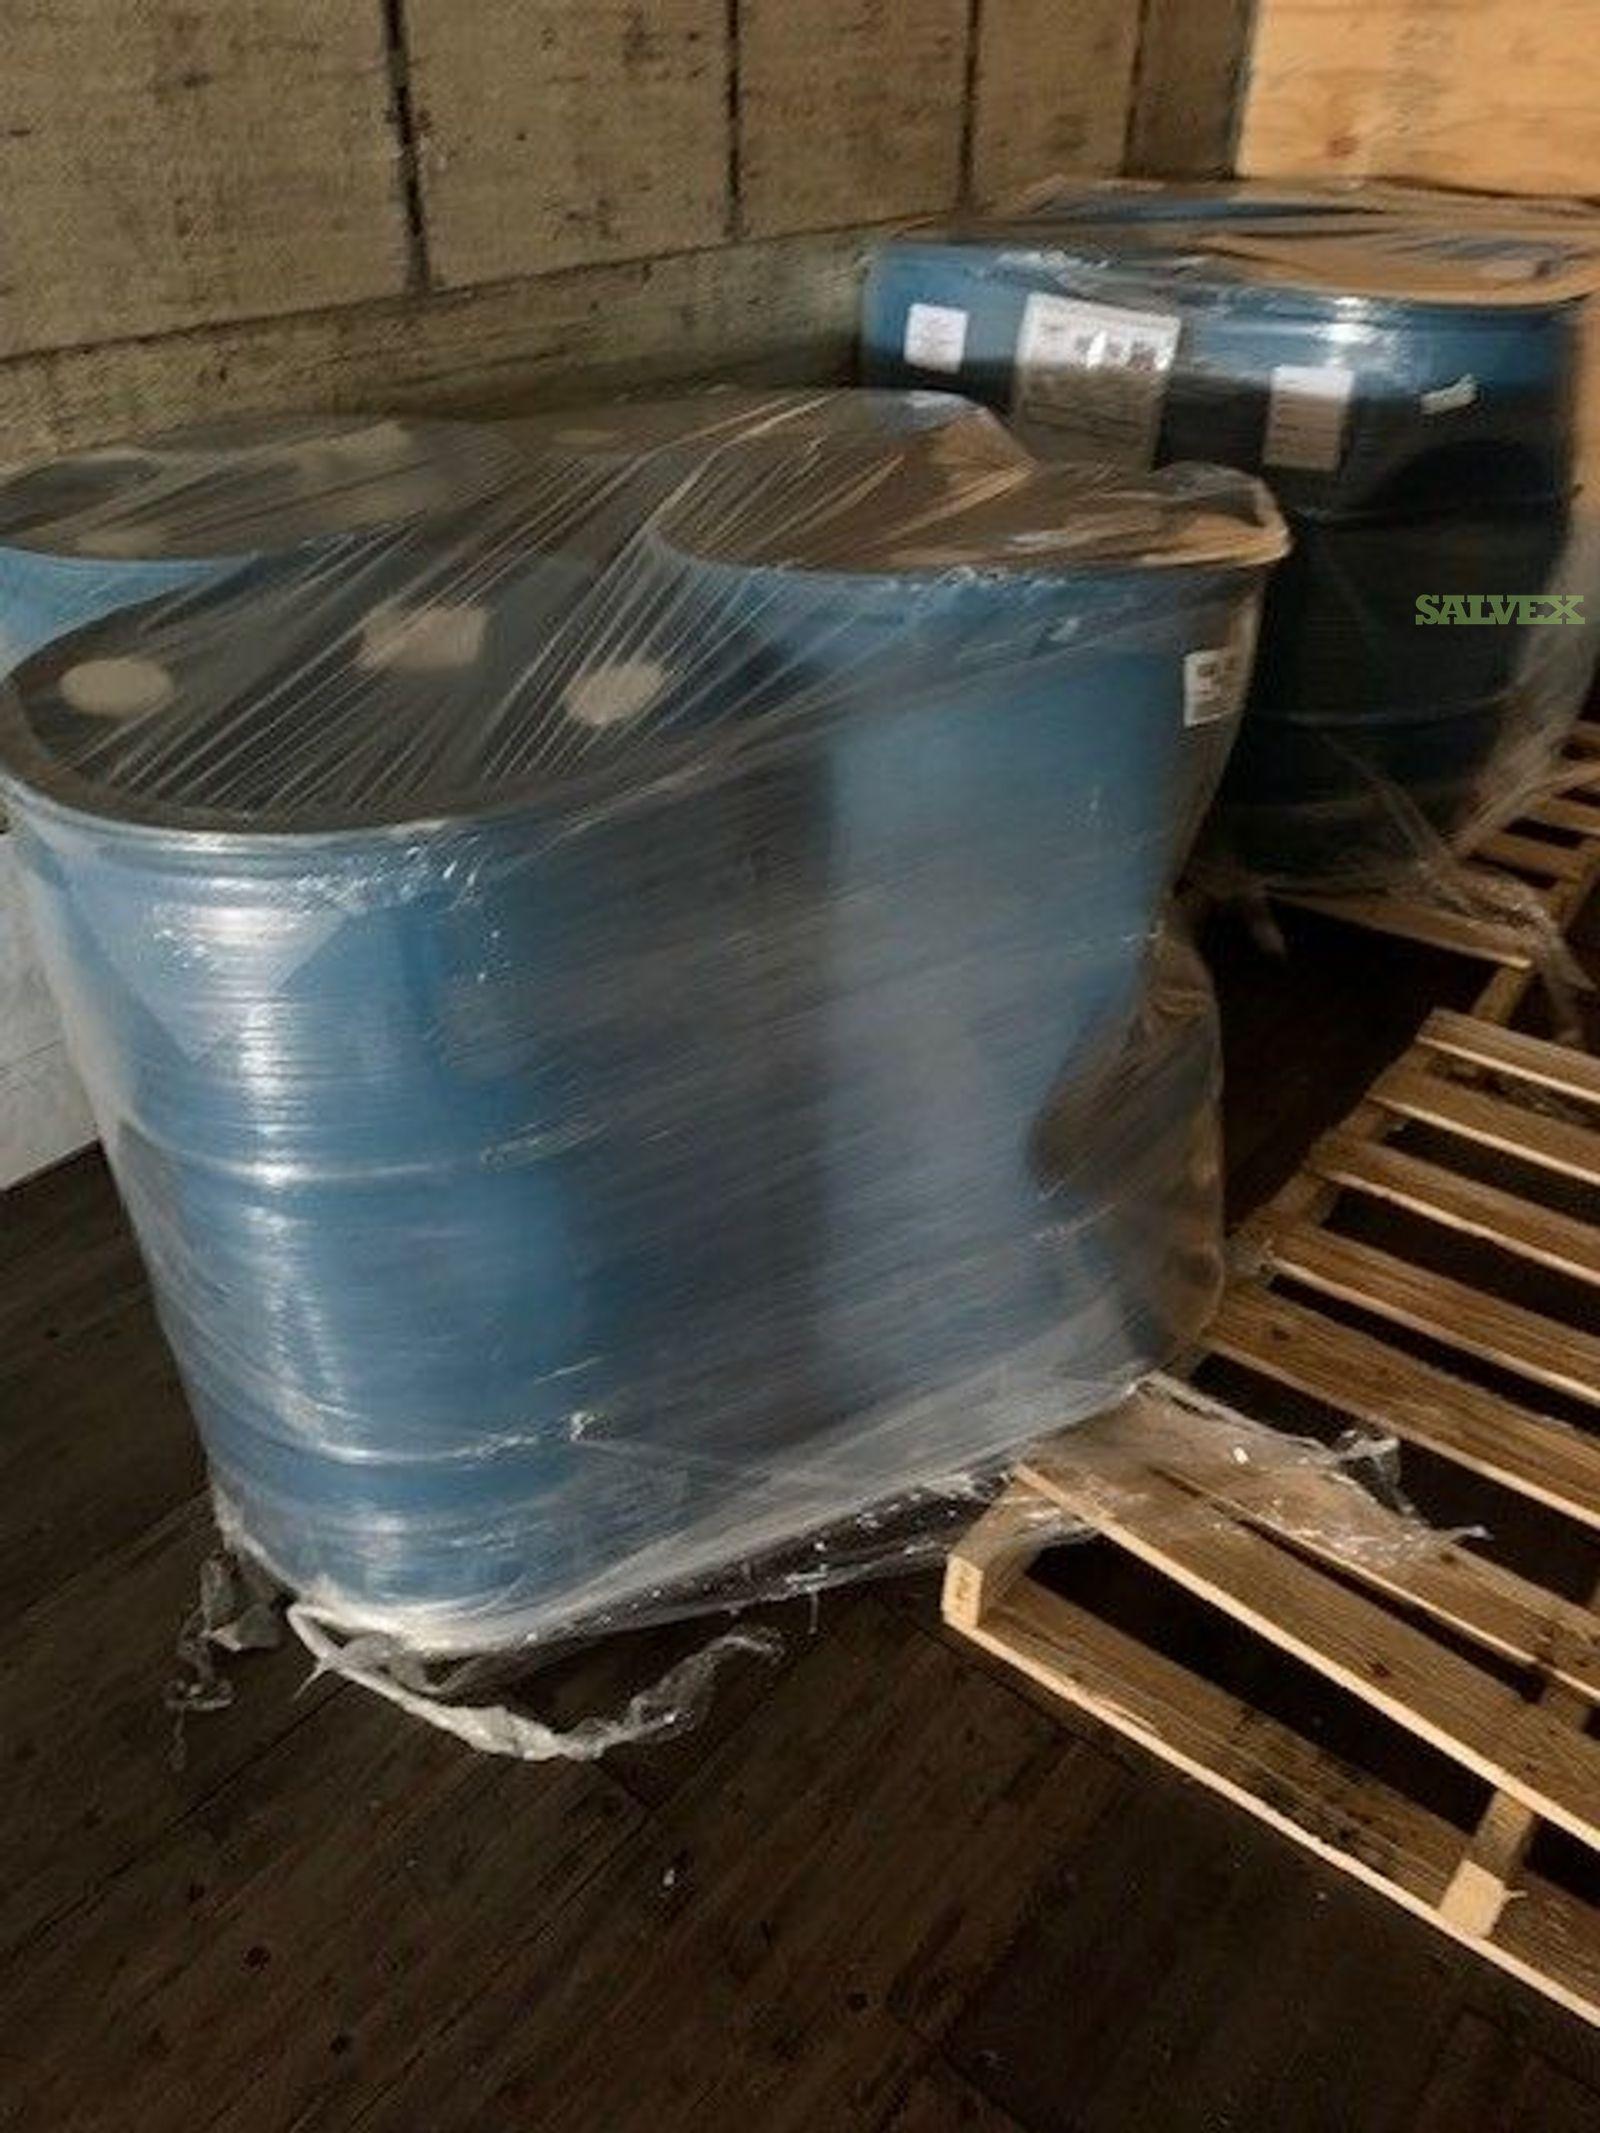 Aloe Vera Gel 10x Concentrate Decolorized (1600 Kg)